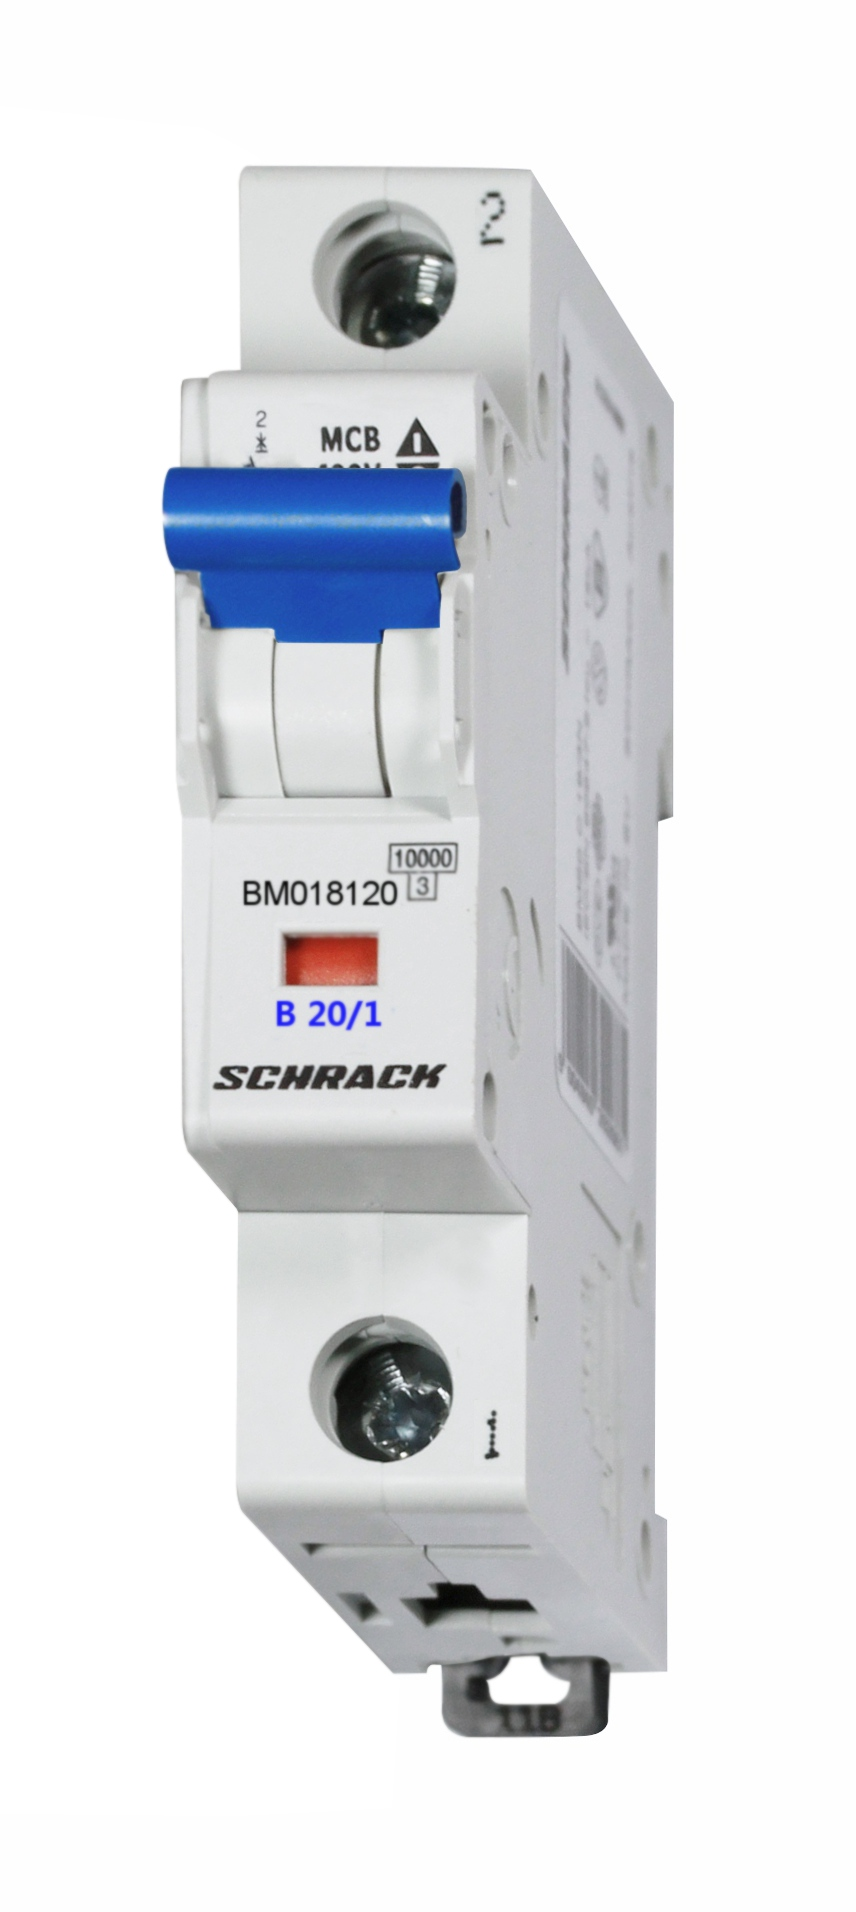 BM018120 - Schrack Technik